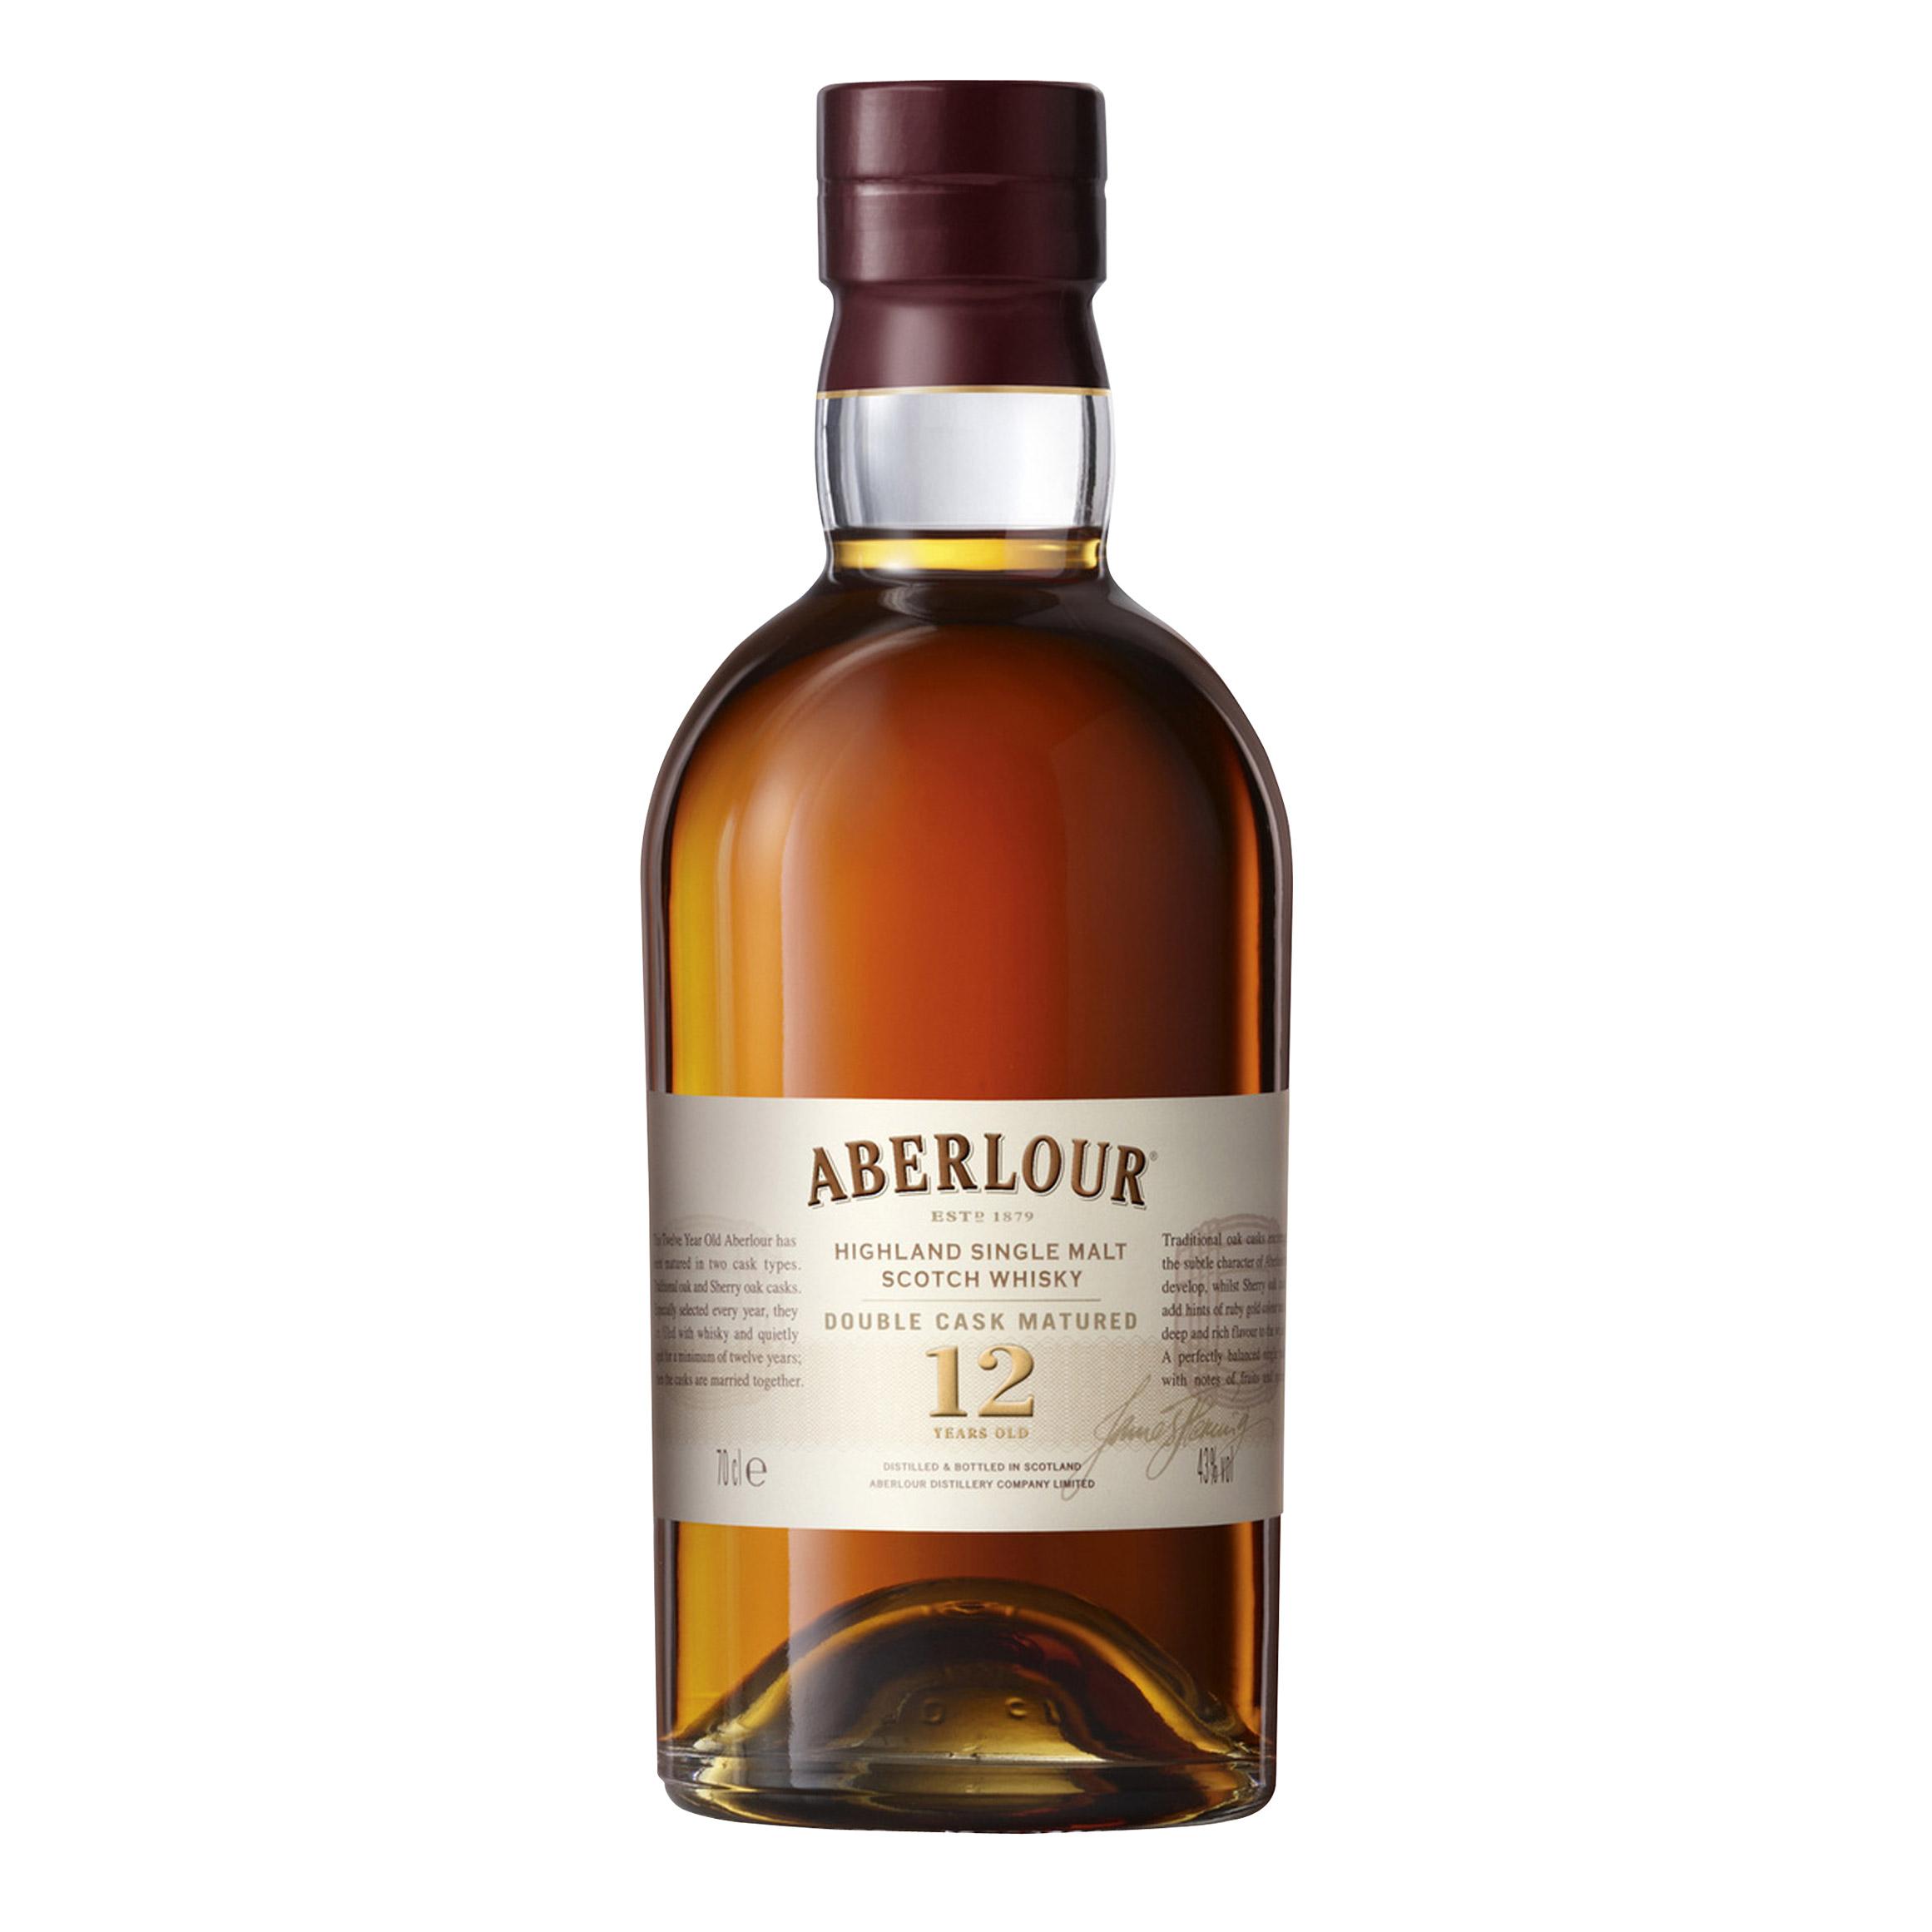 Aberlour 12 Double Cask Single Malt Scotch on clearance for $19.97 @ Costco B&M YMMV